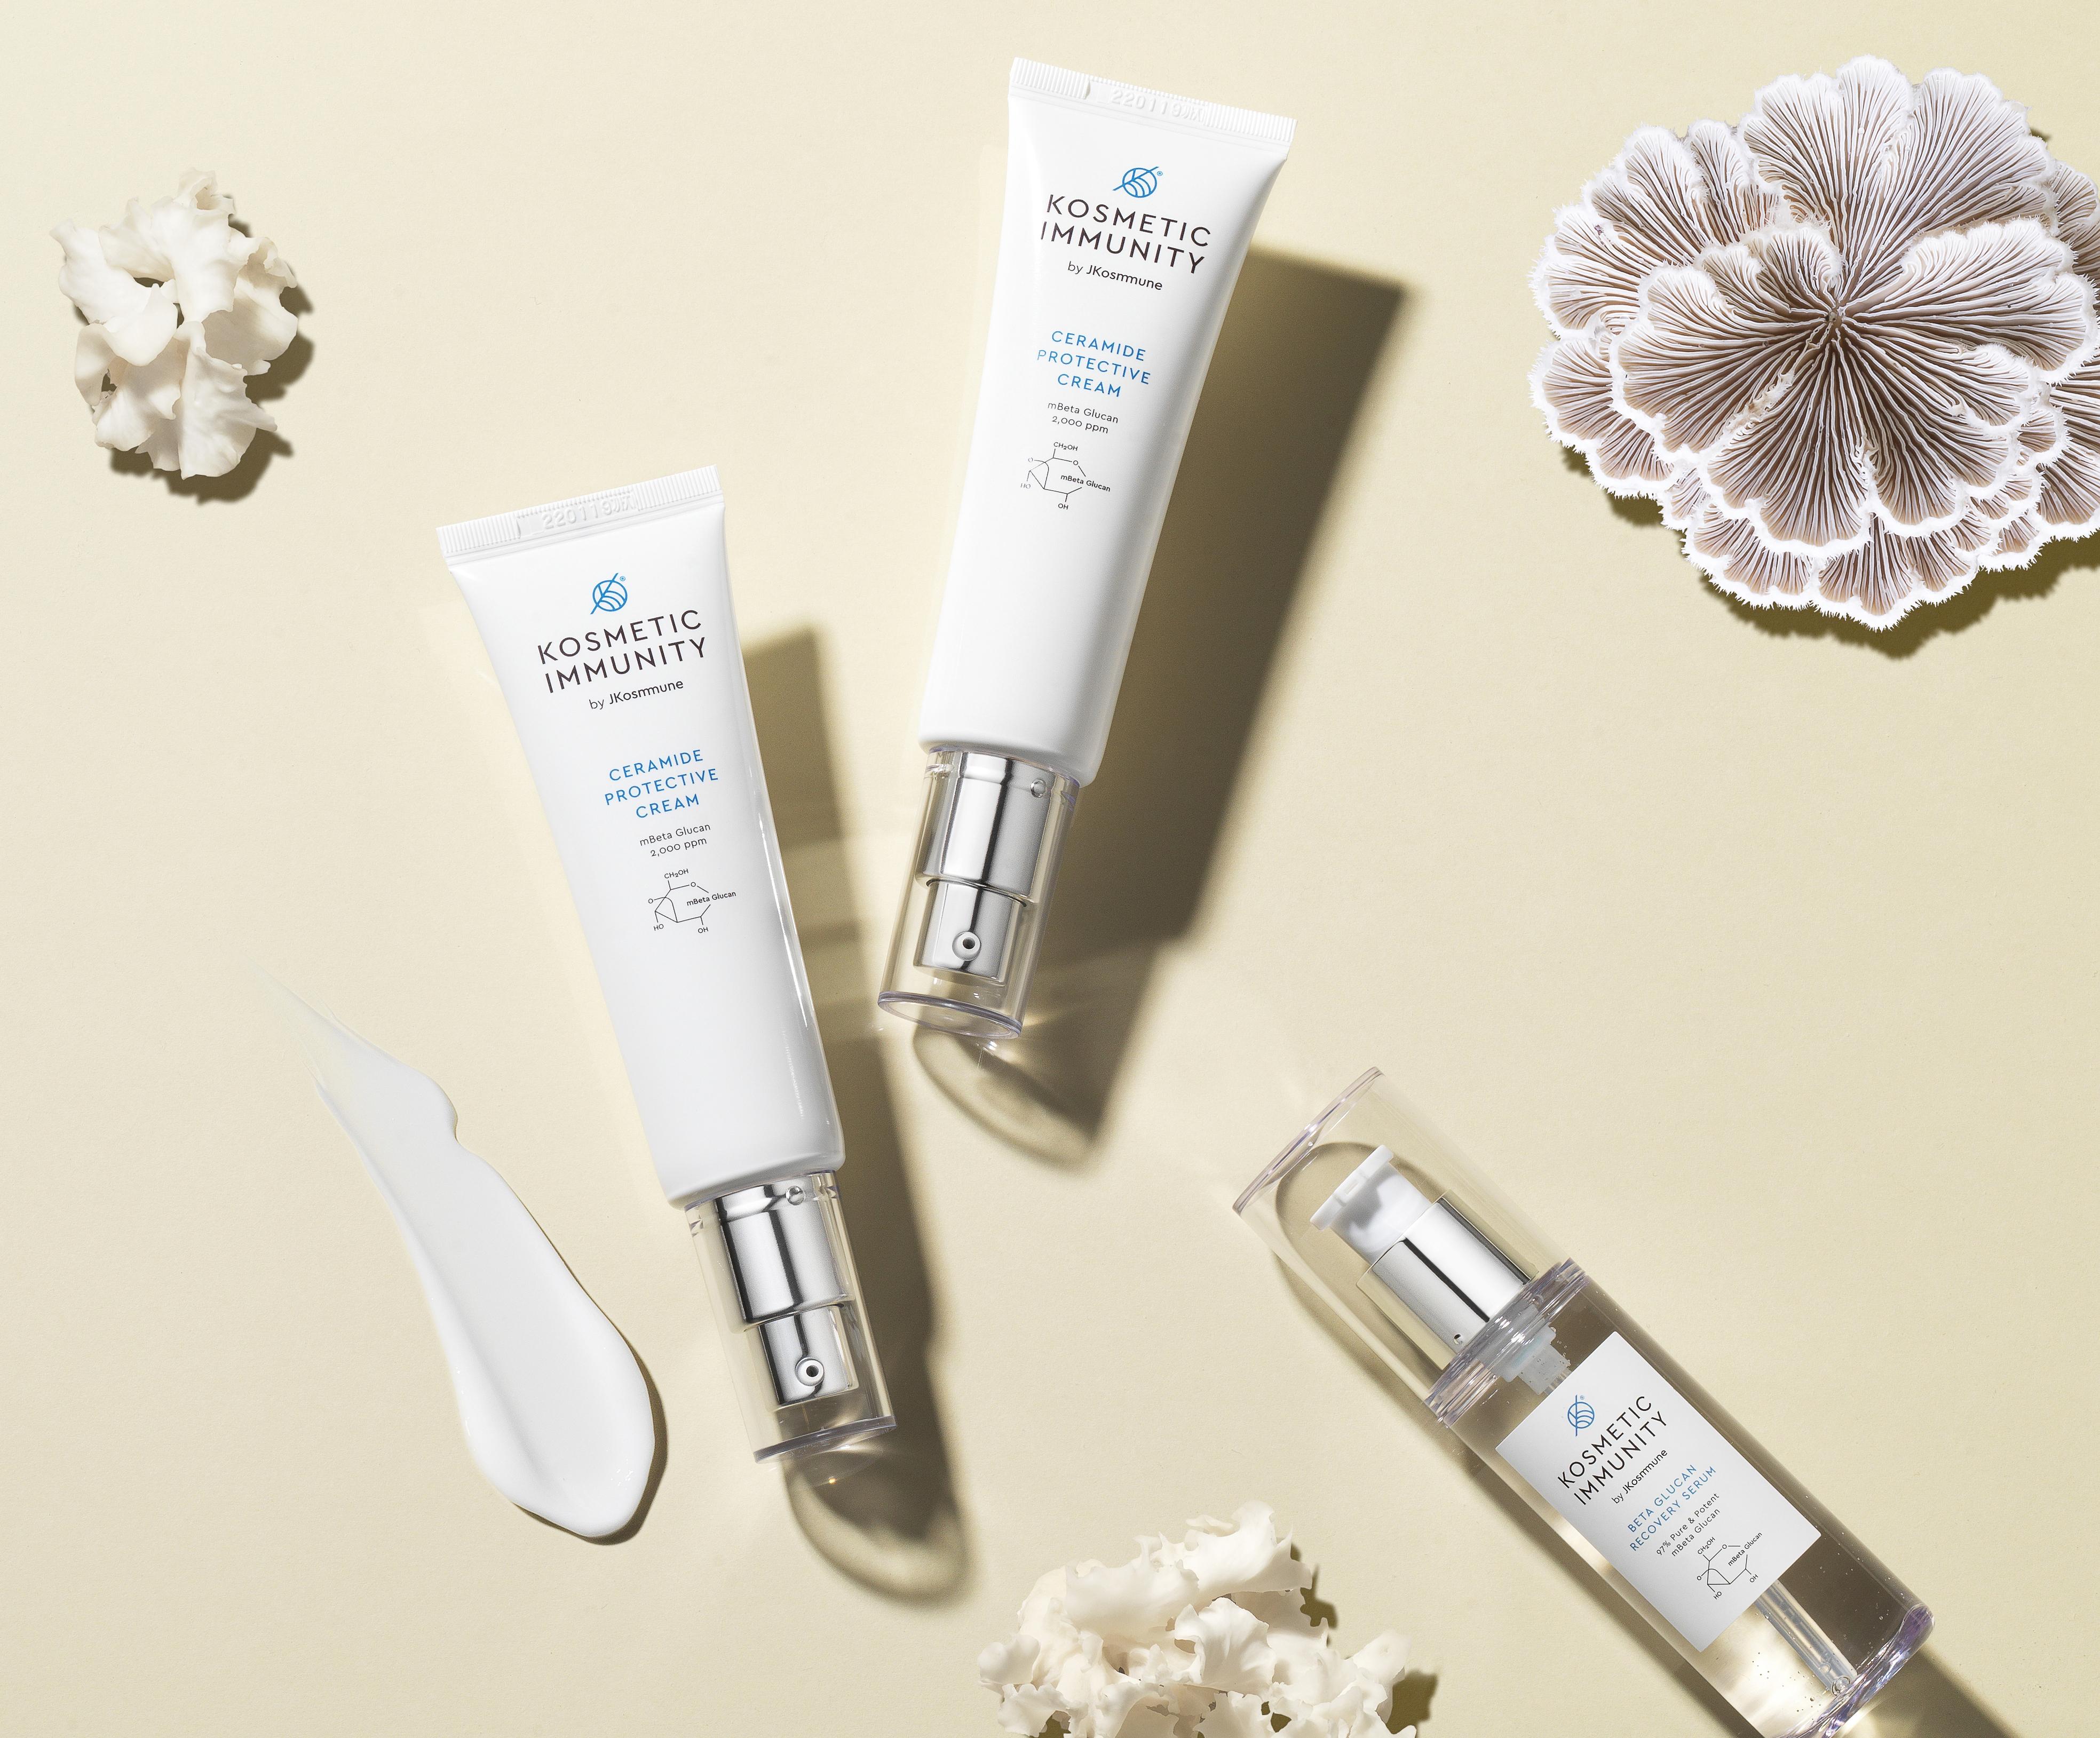 Kosmetic Immunity by JKosmmune Ceramide Protective Cream